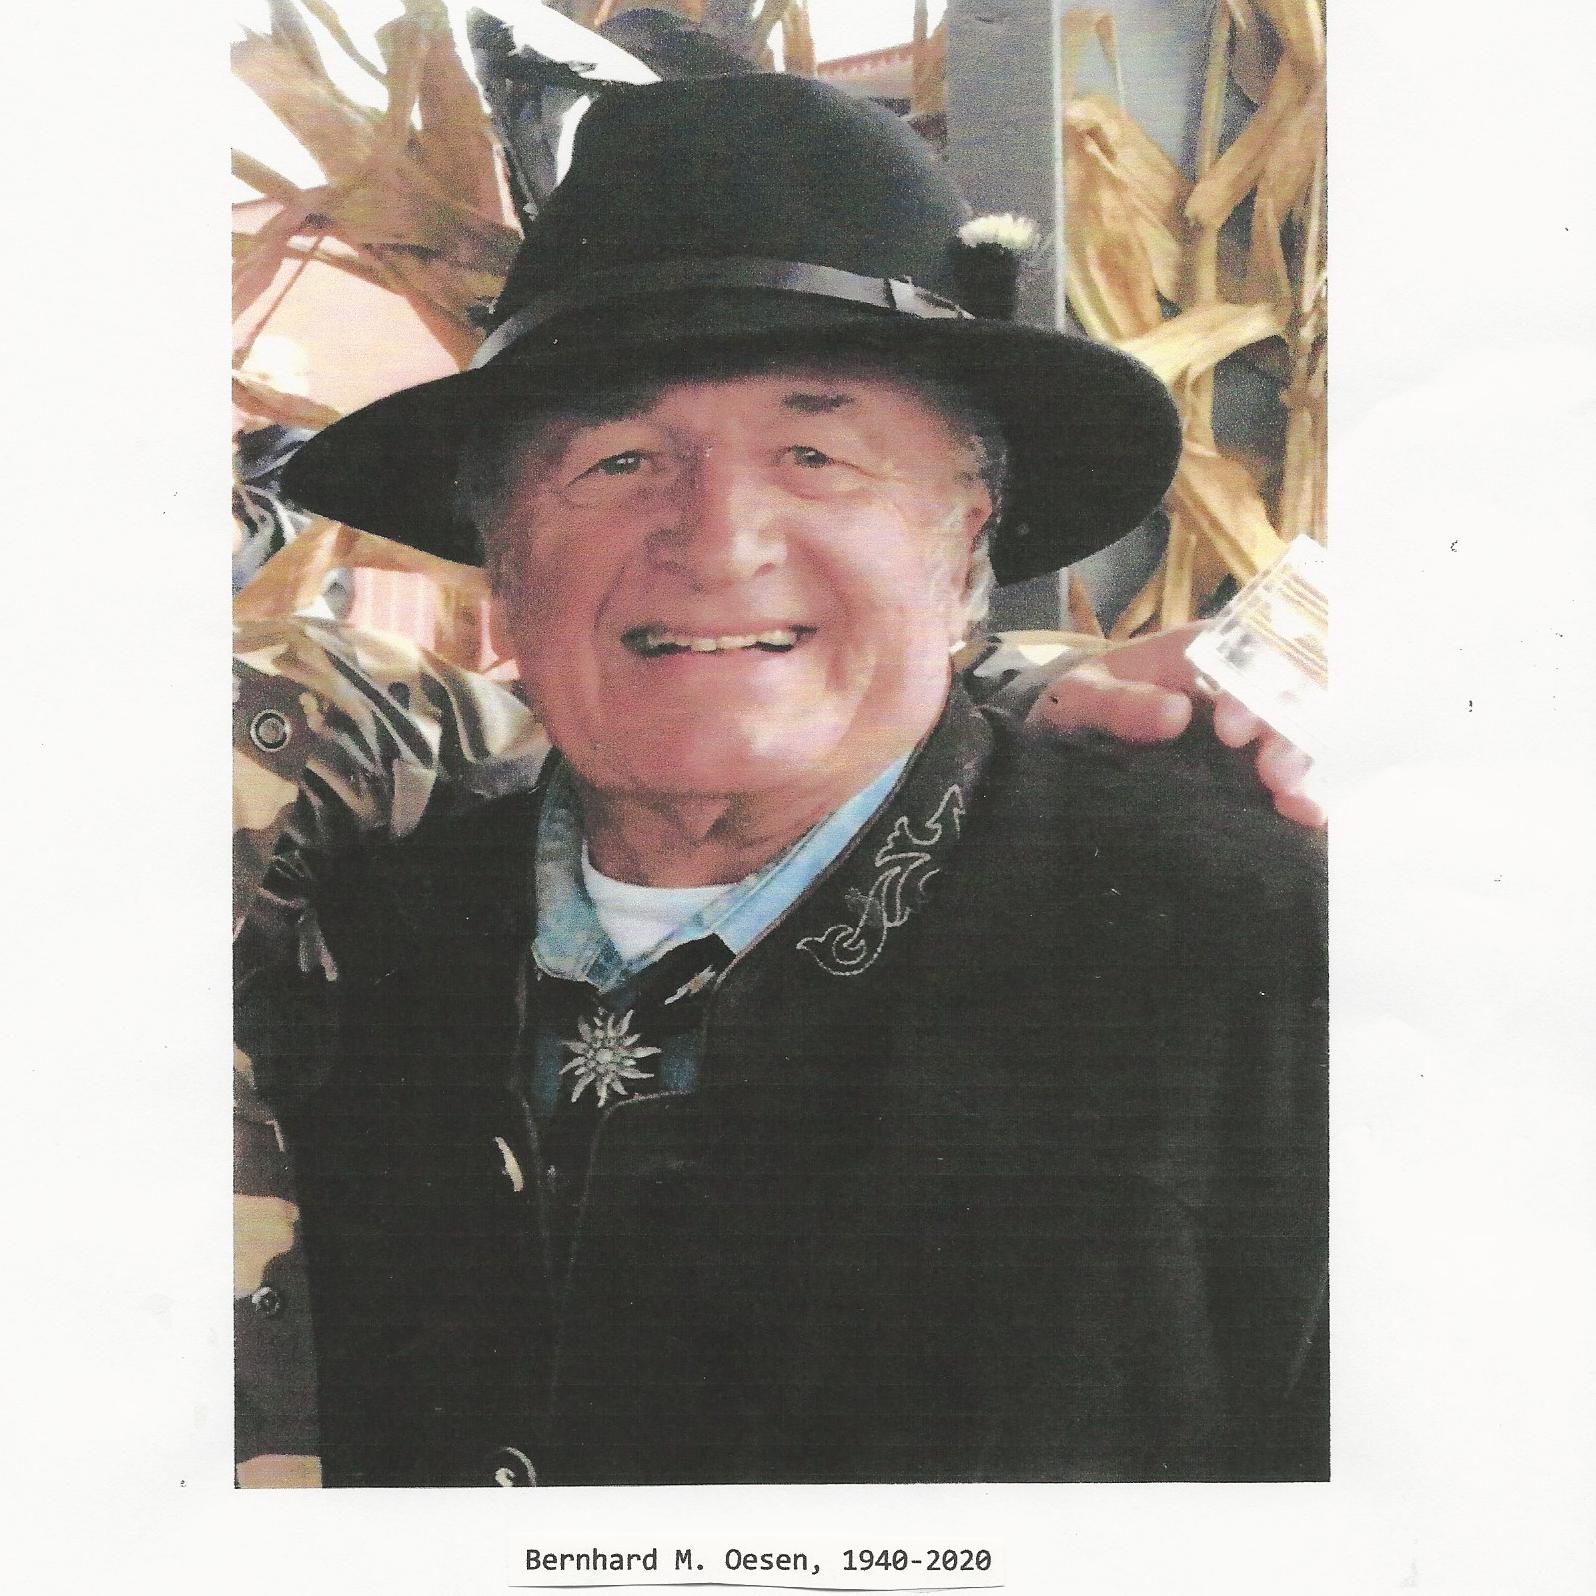 Photo of Bernhard Oesen in a black hat